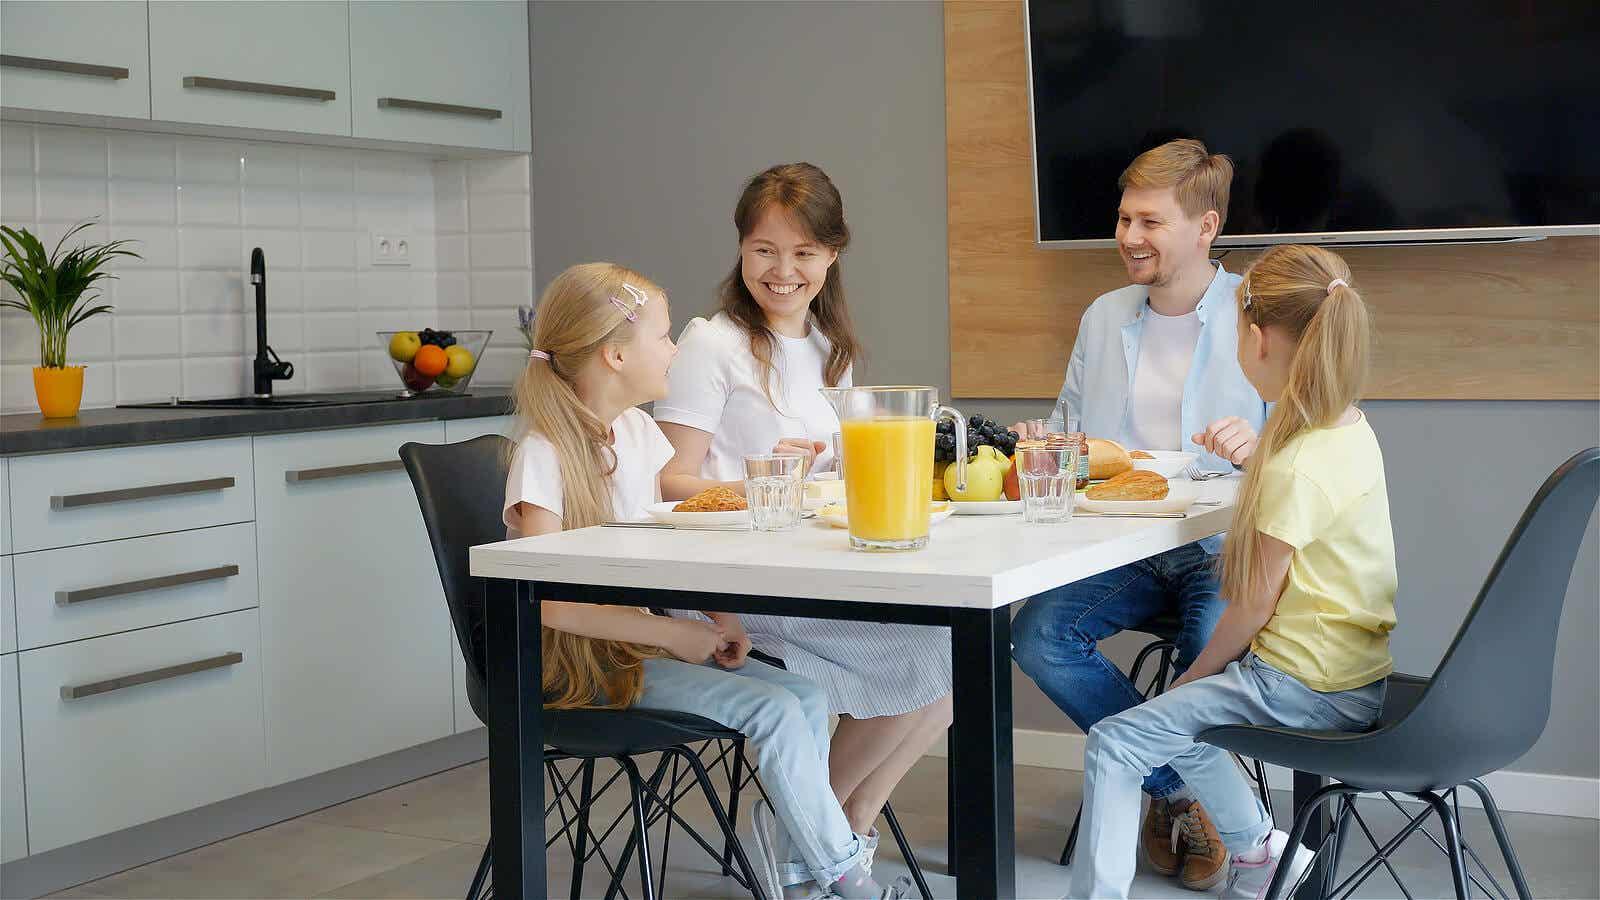 A family enjoying a meal.